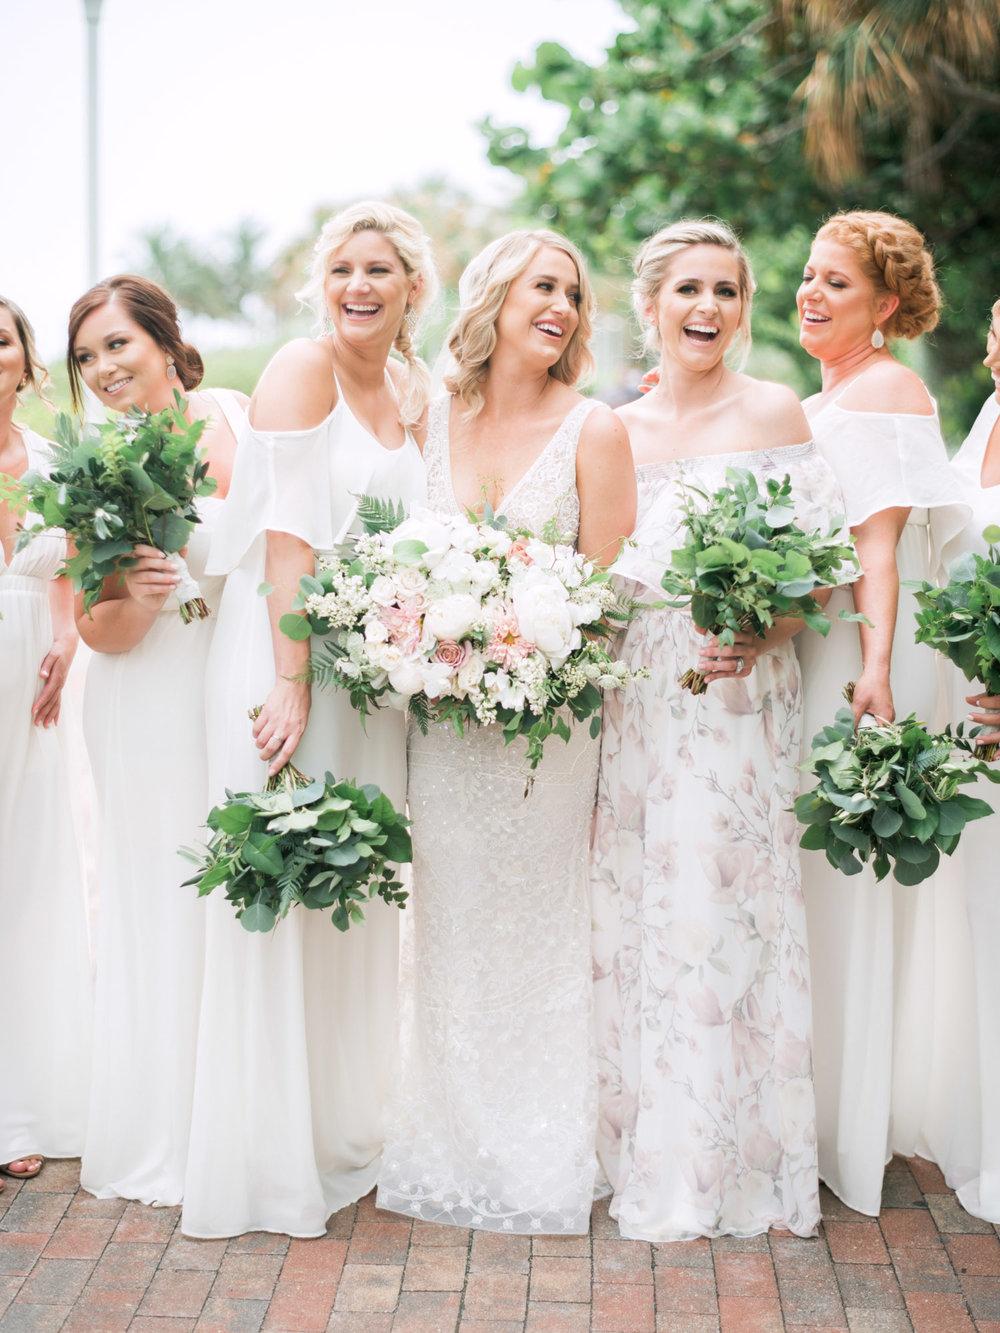 raleigh-miami-beach-destination-film-wedding-0738.jpg